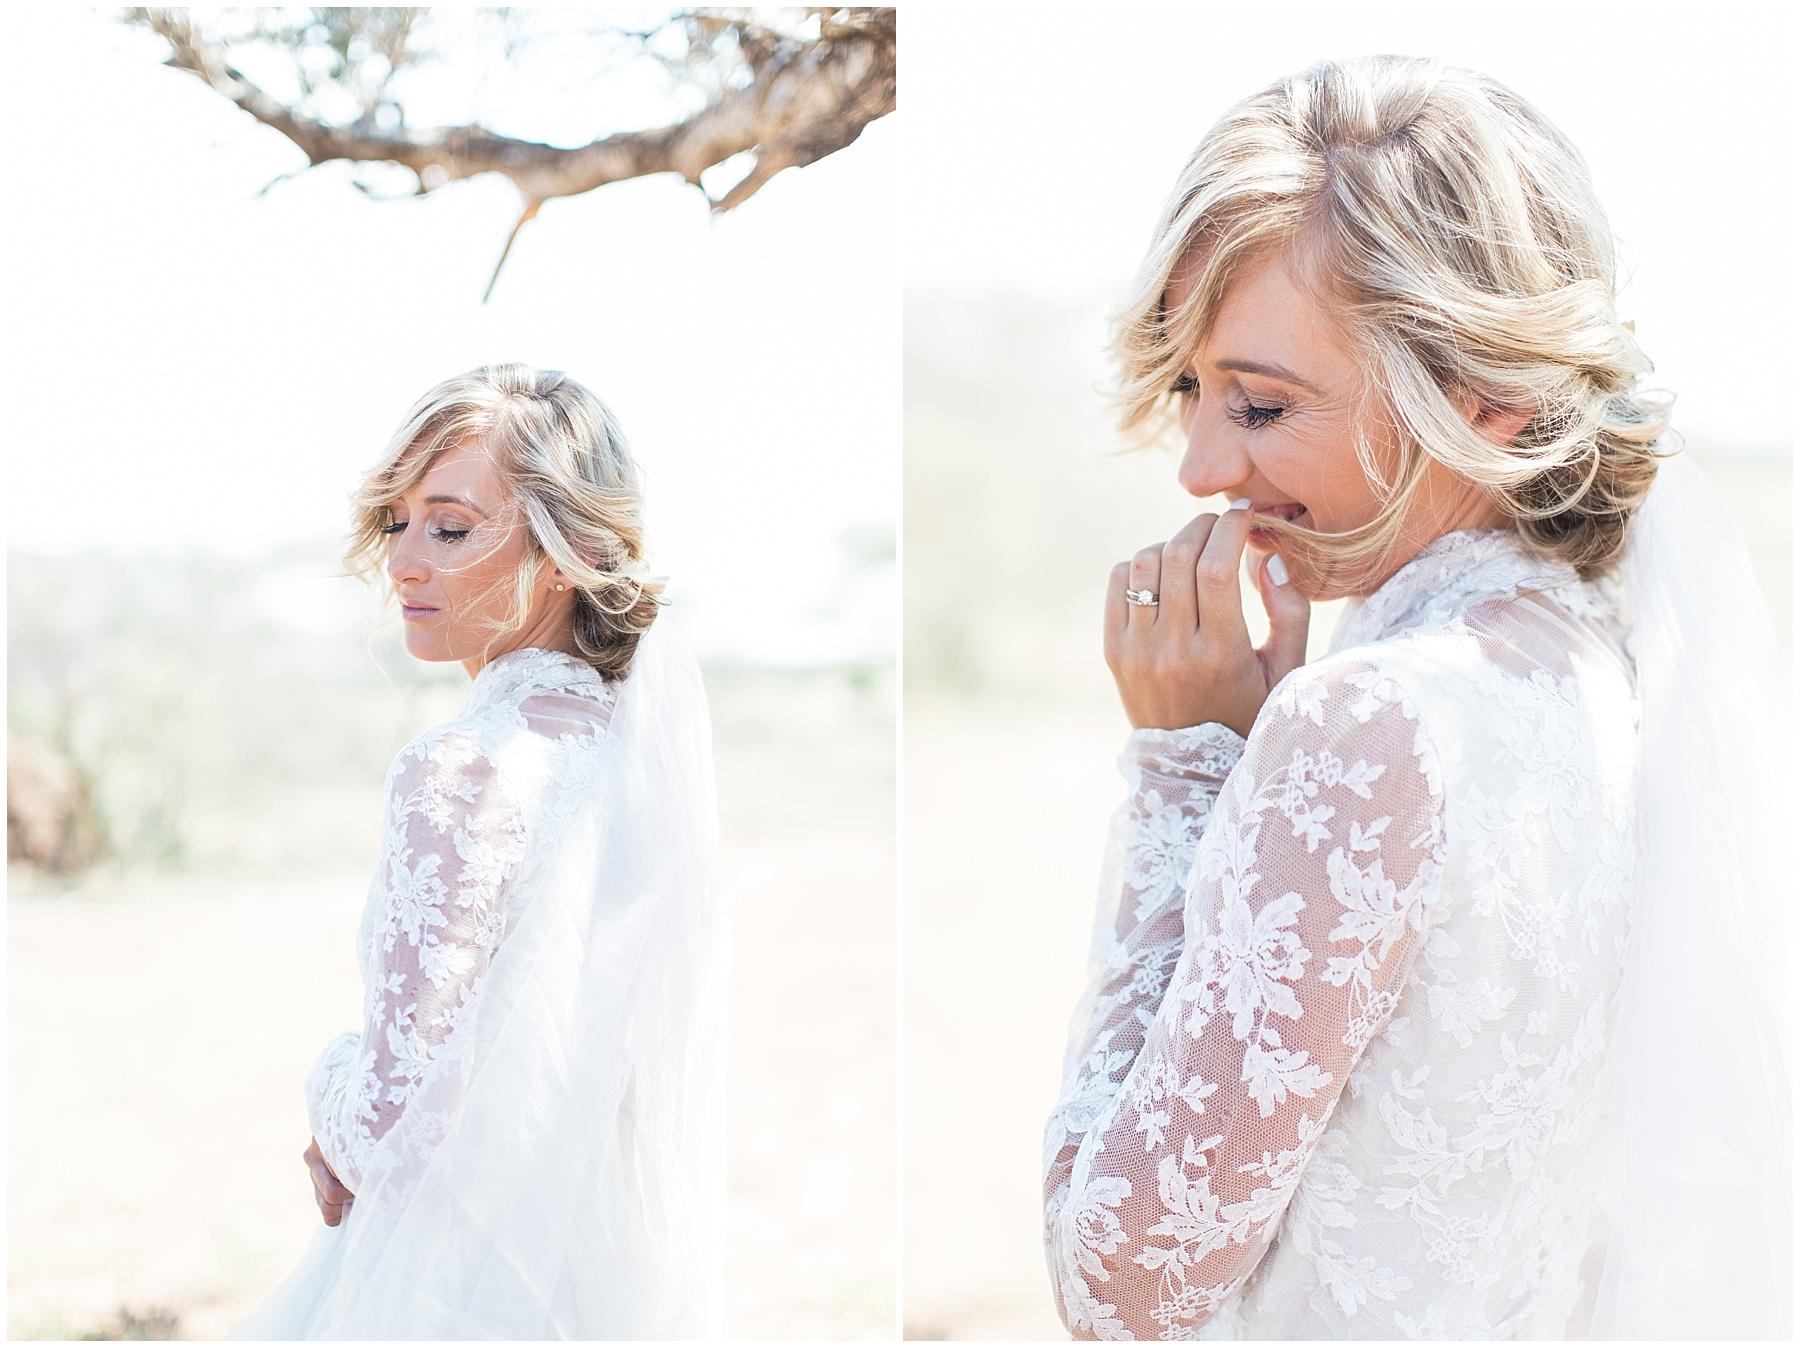 AliciaLandman_JoleneandZander_Wedding_The Pretty Blog_0433.jpg